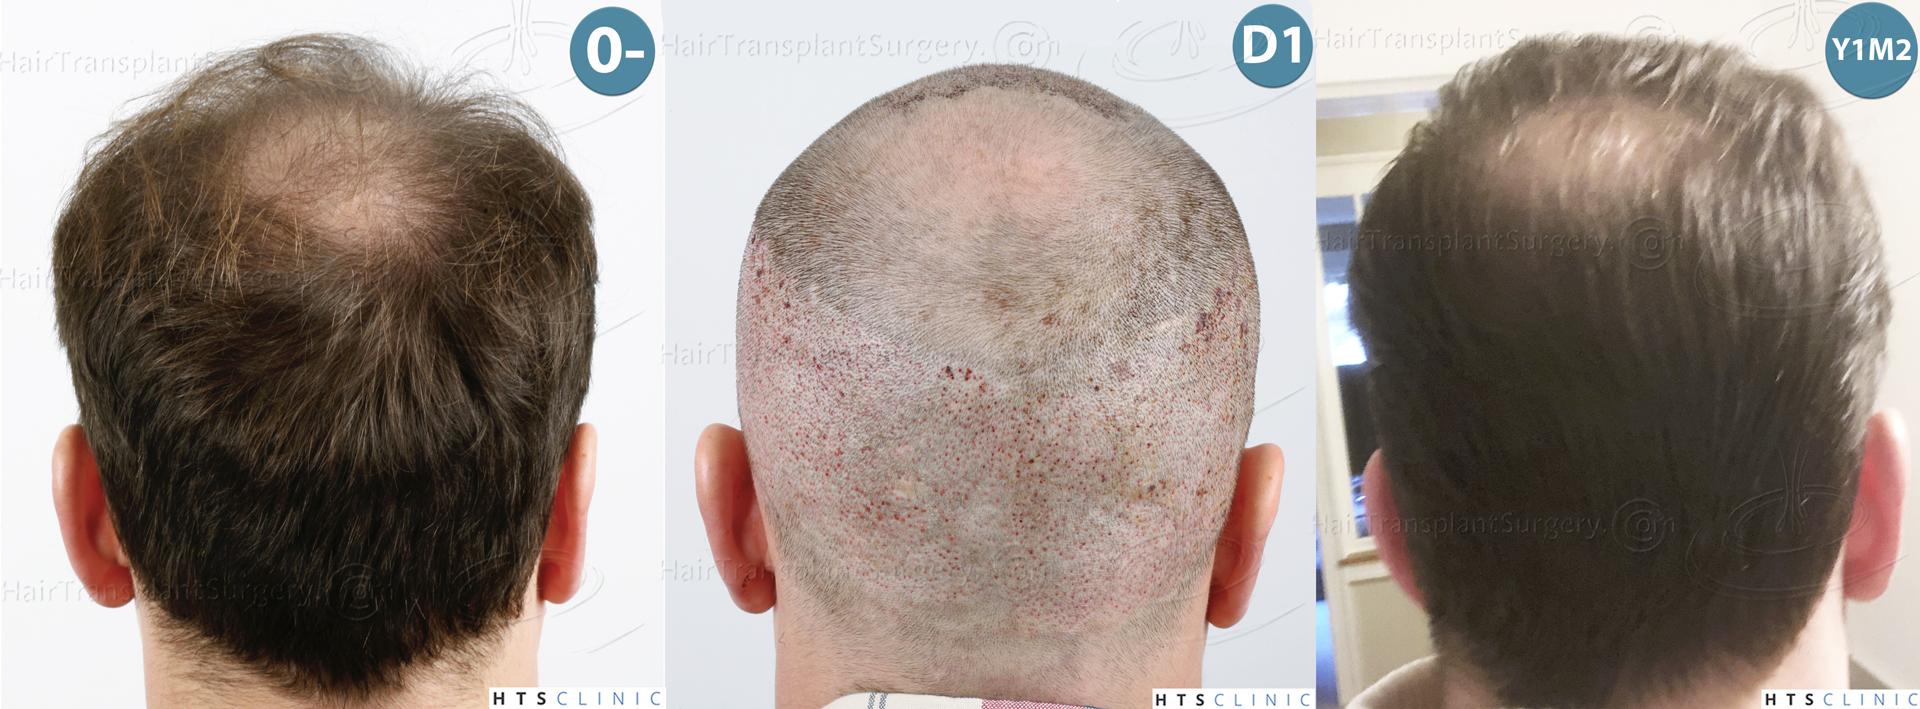 Dr.Devroye-HTS-Clinic-3878-FUE-NW-V-Montage-5.jpg